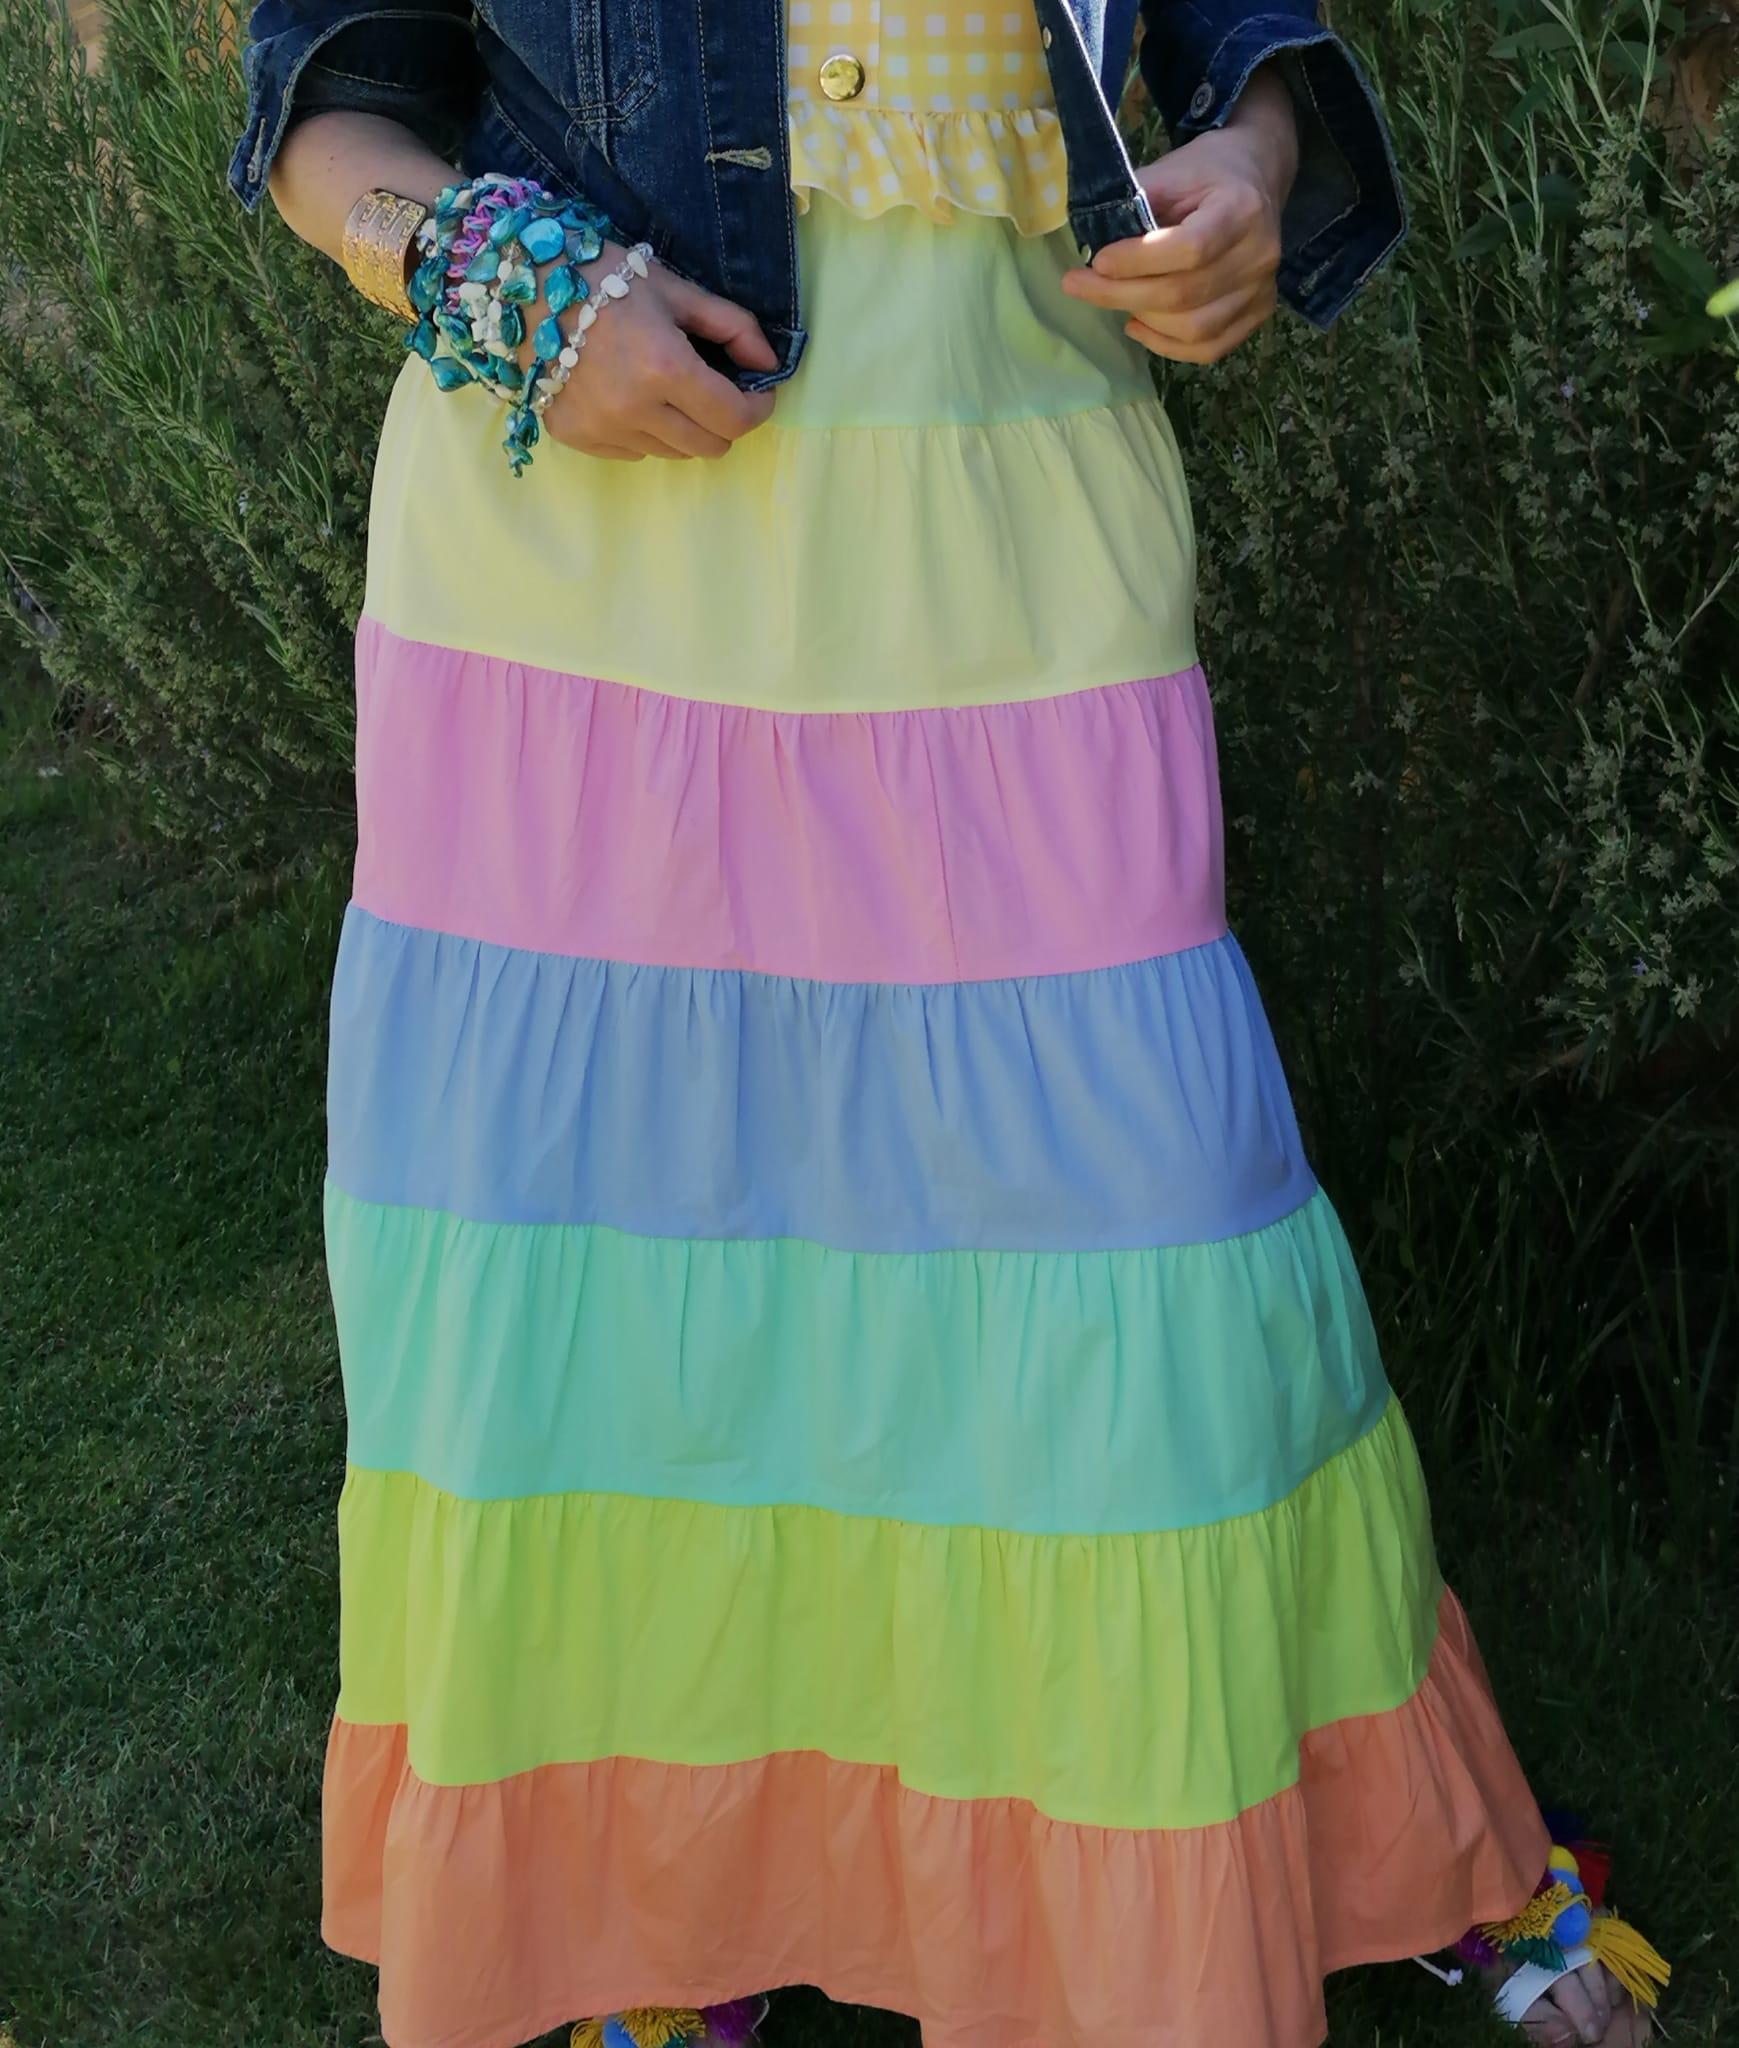 Falda color arcoiris de Pasodoble en Palencia